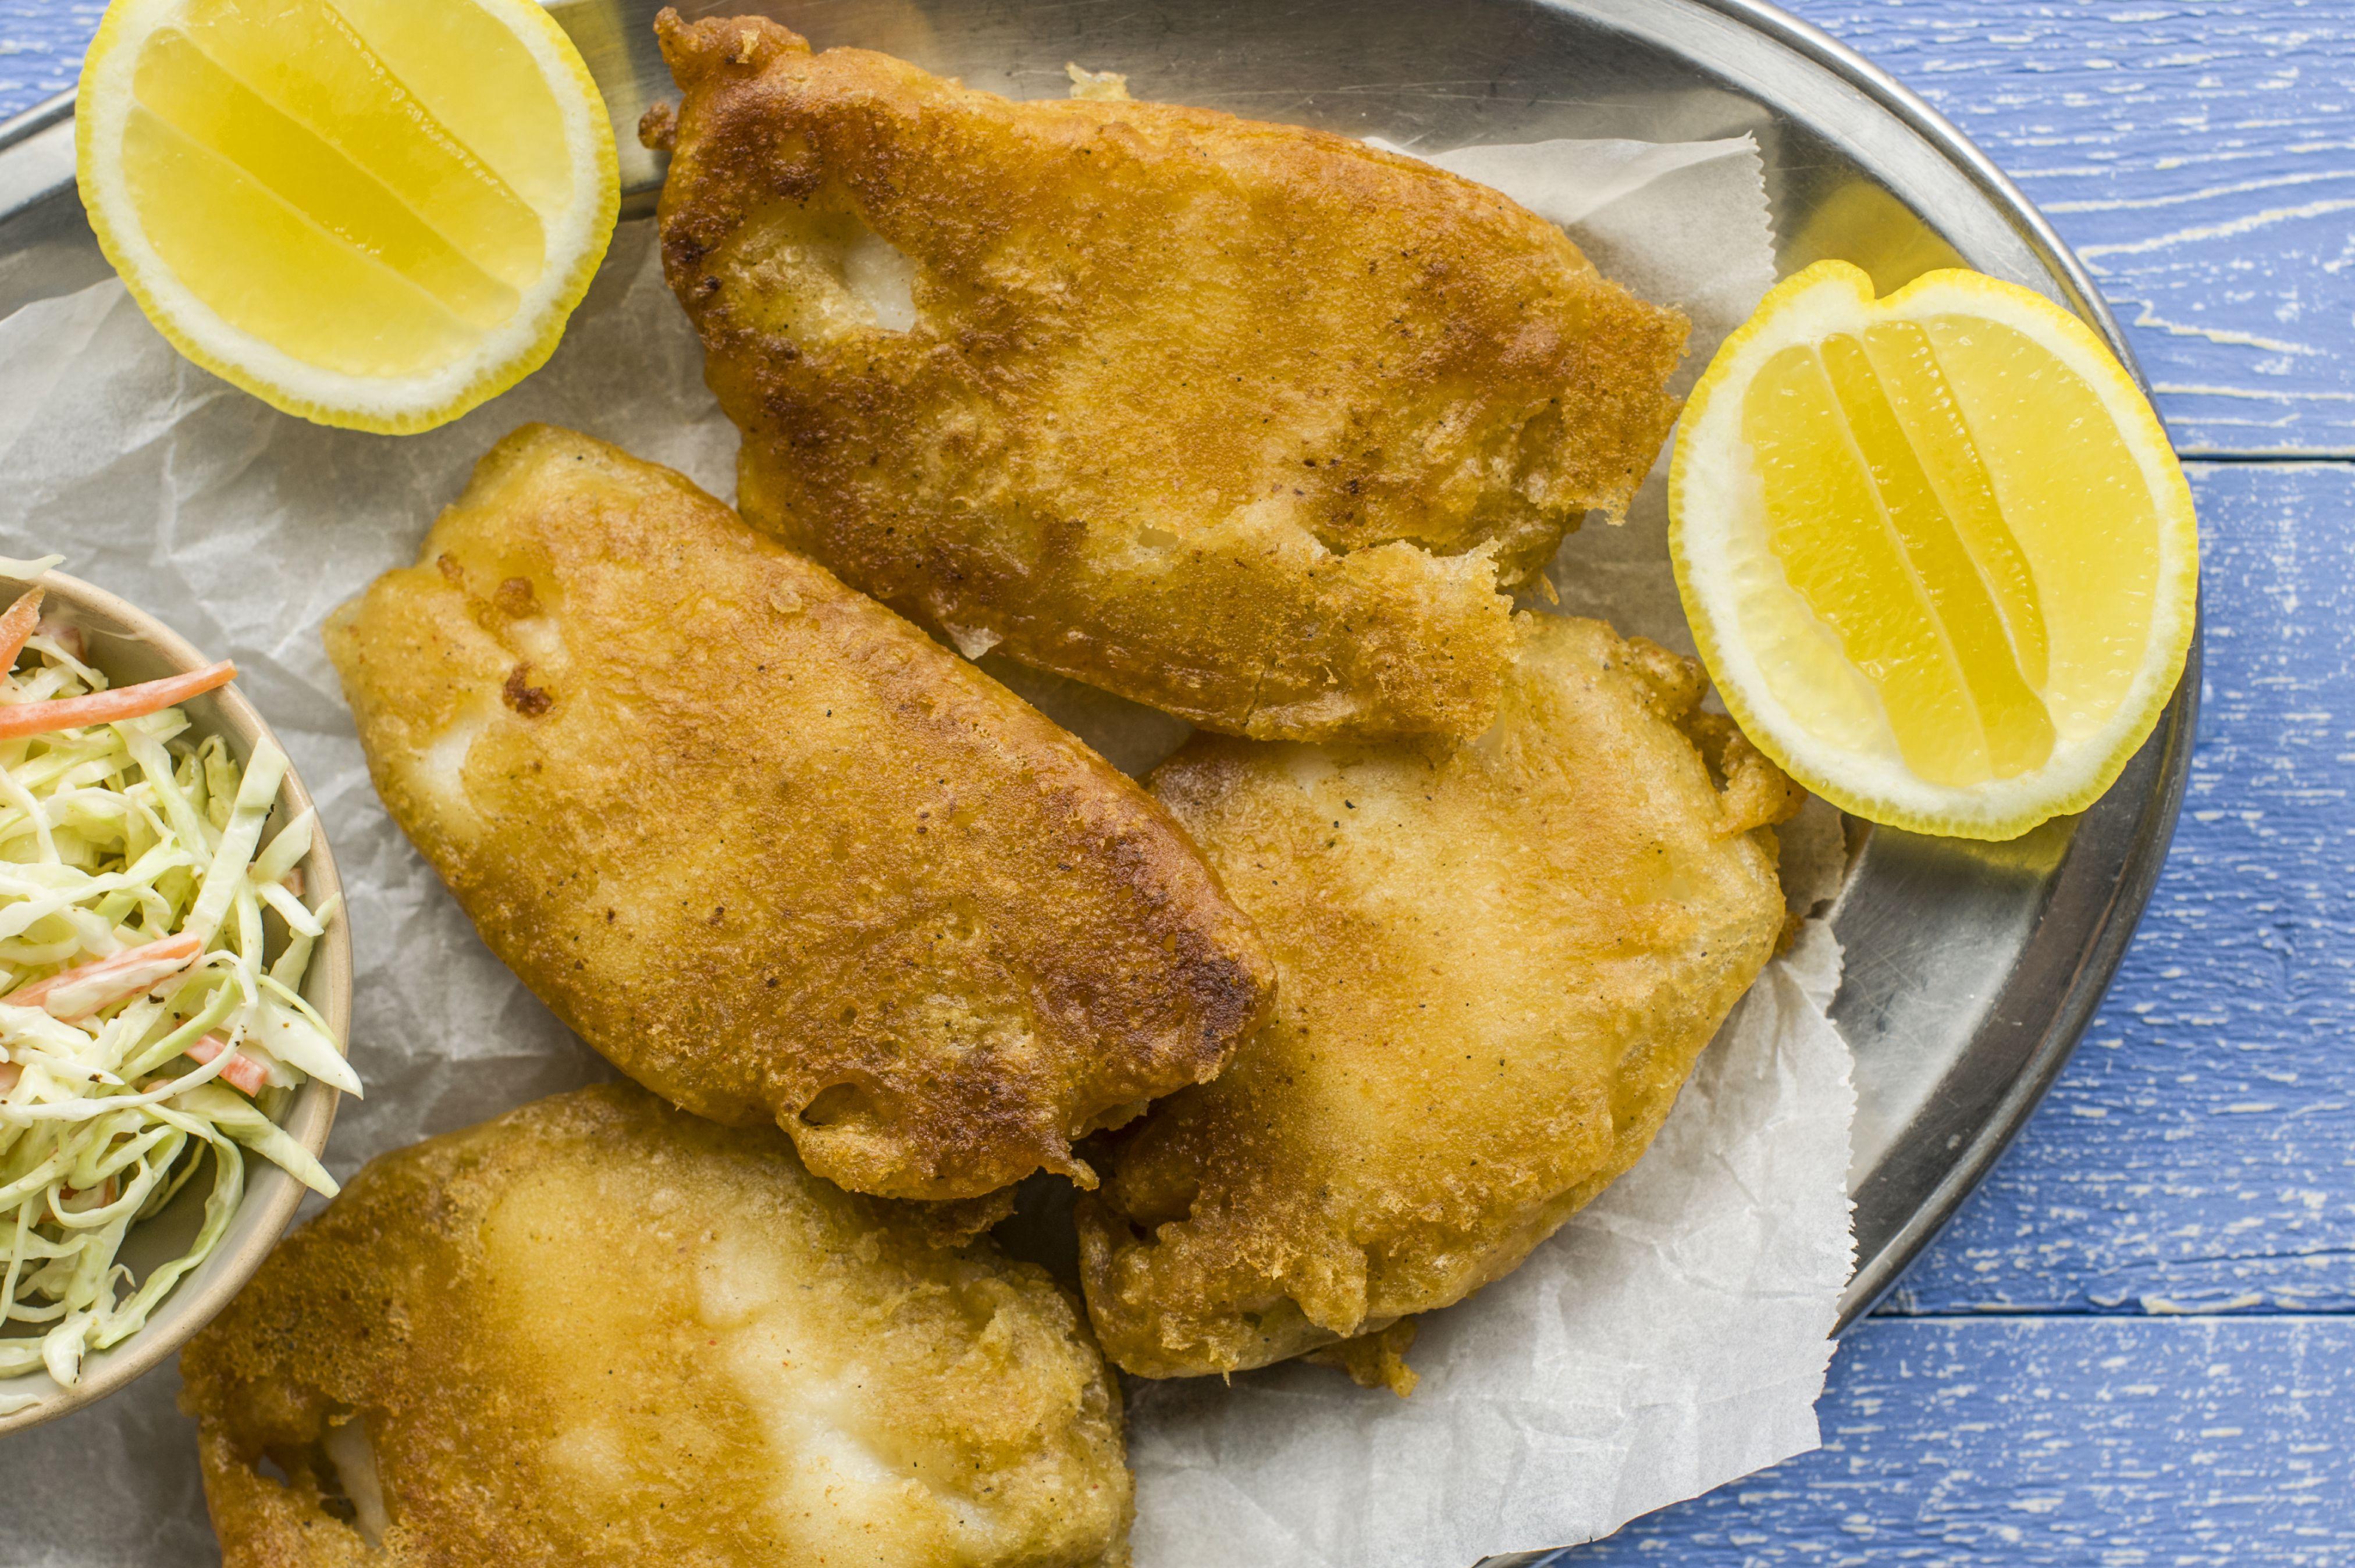 Gluten-Free Beer-Battered Fried Fish Recipe